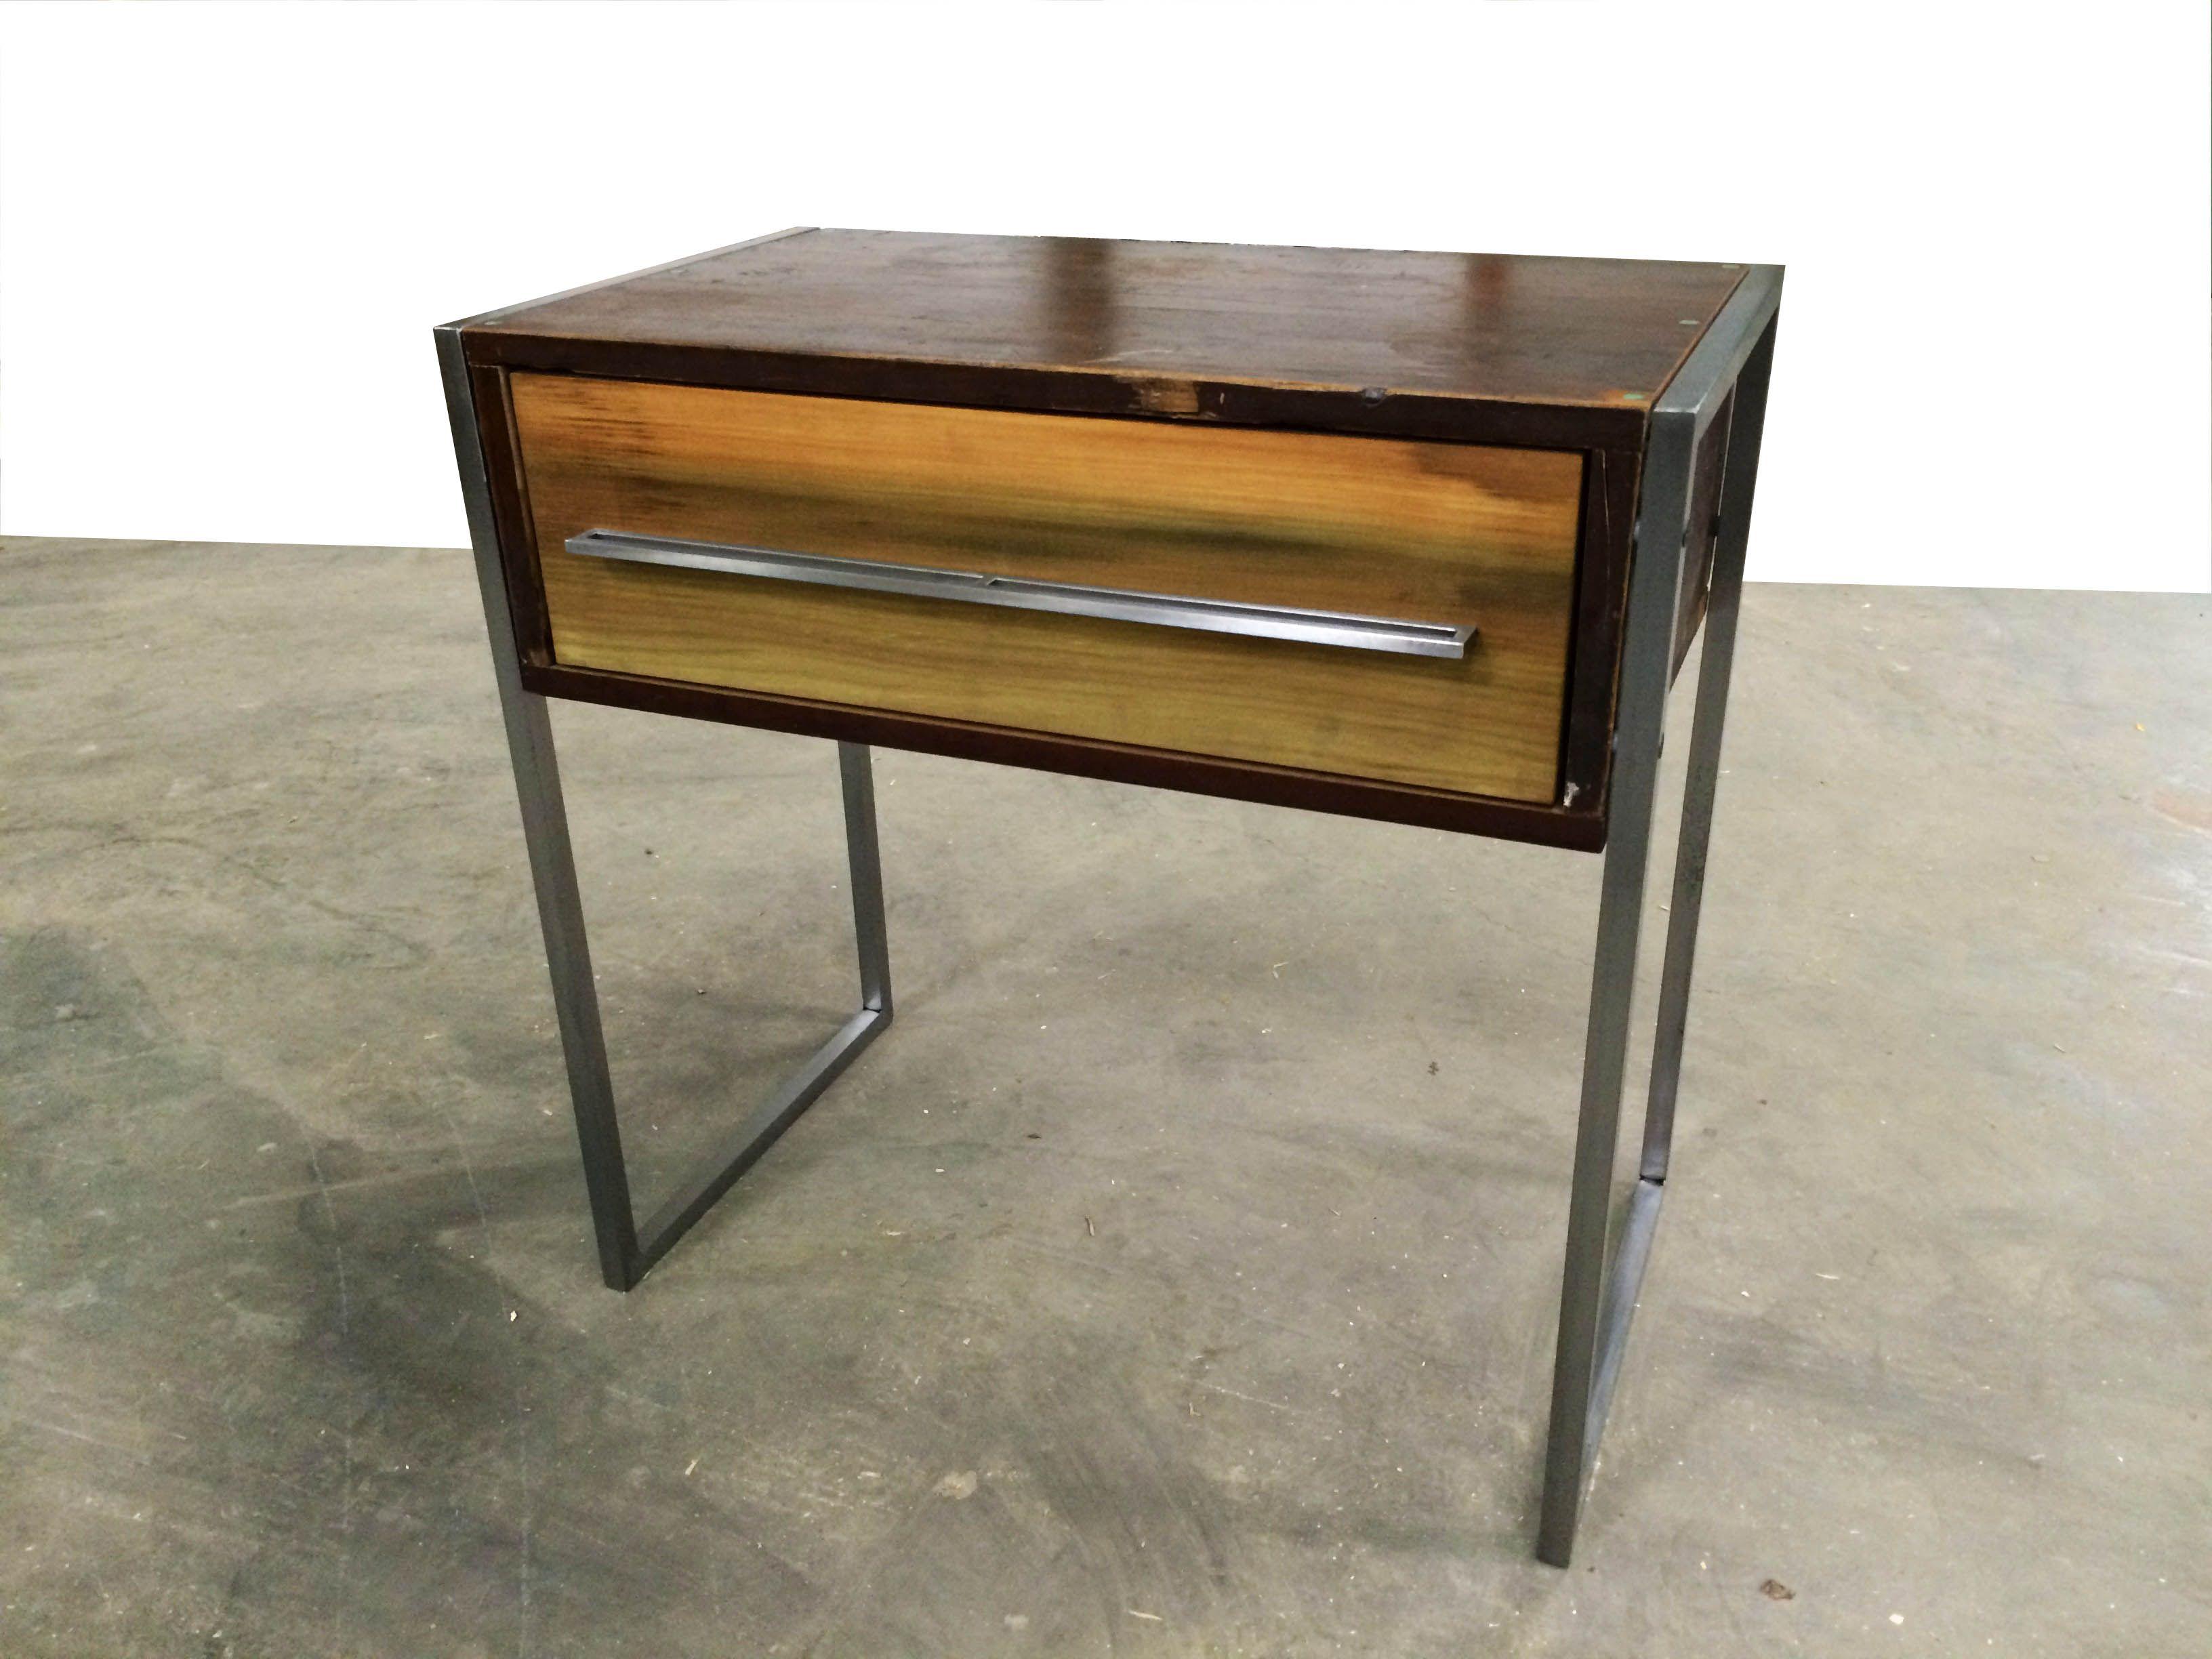 metal night stands - custom nightstands handmade bedside tables custommadecom